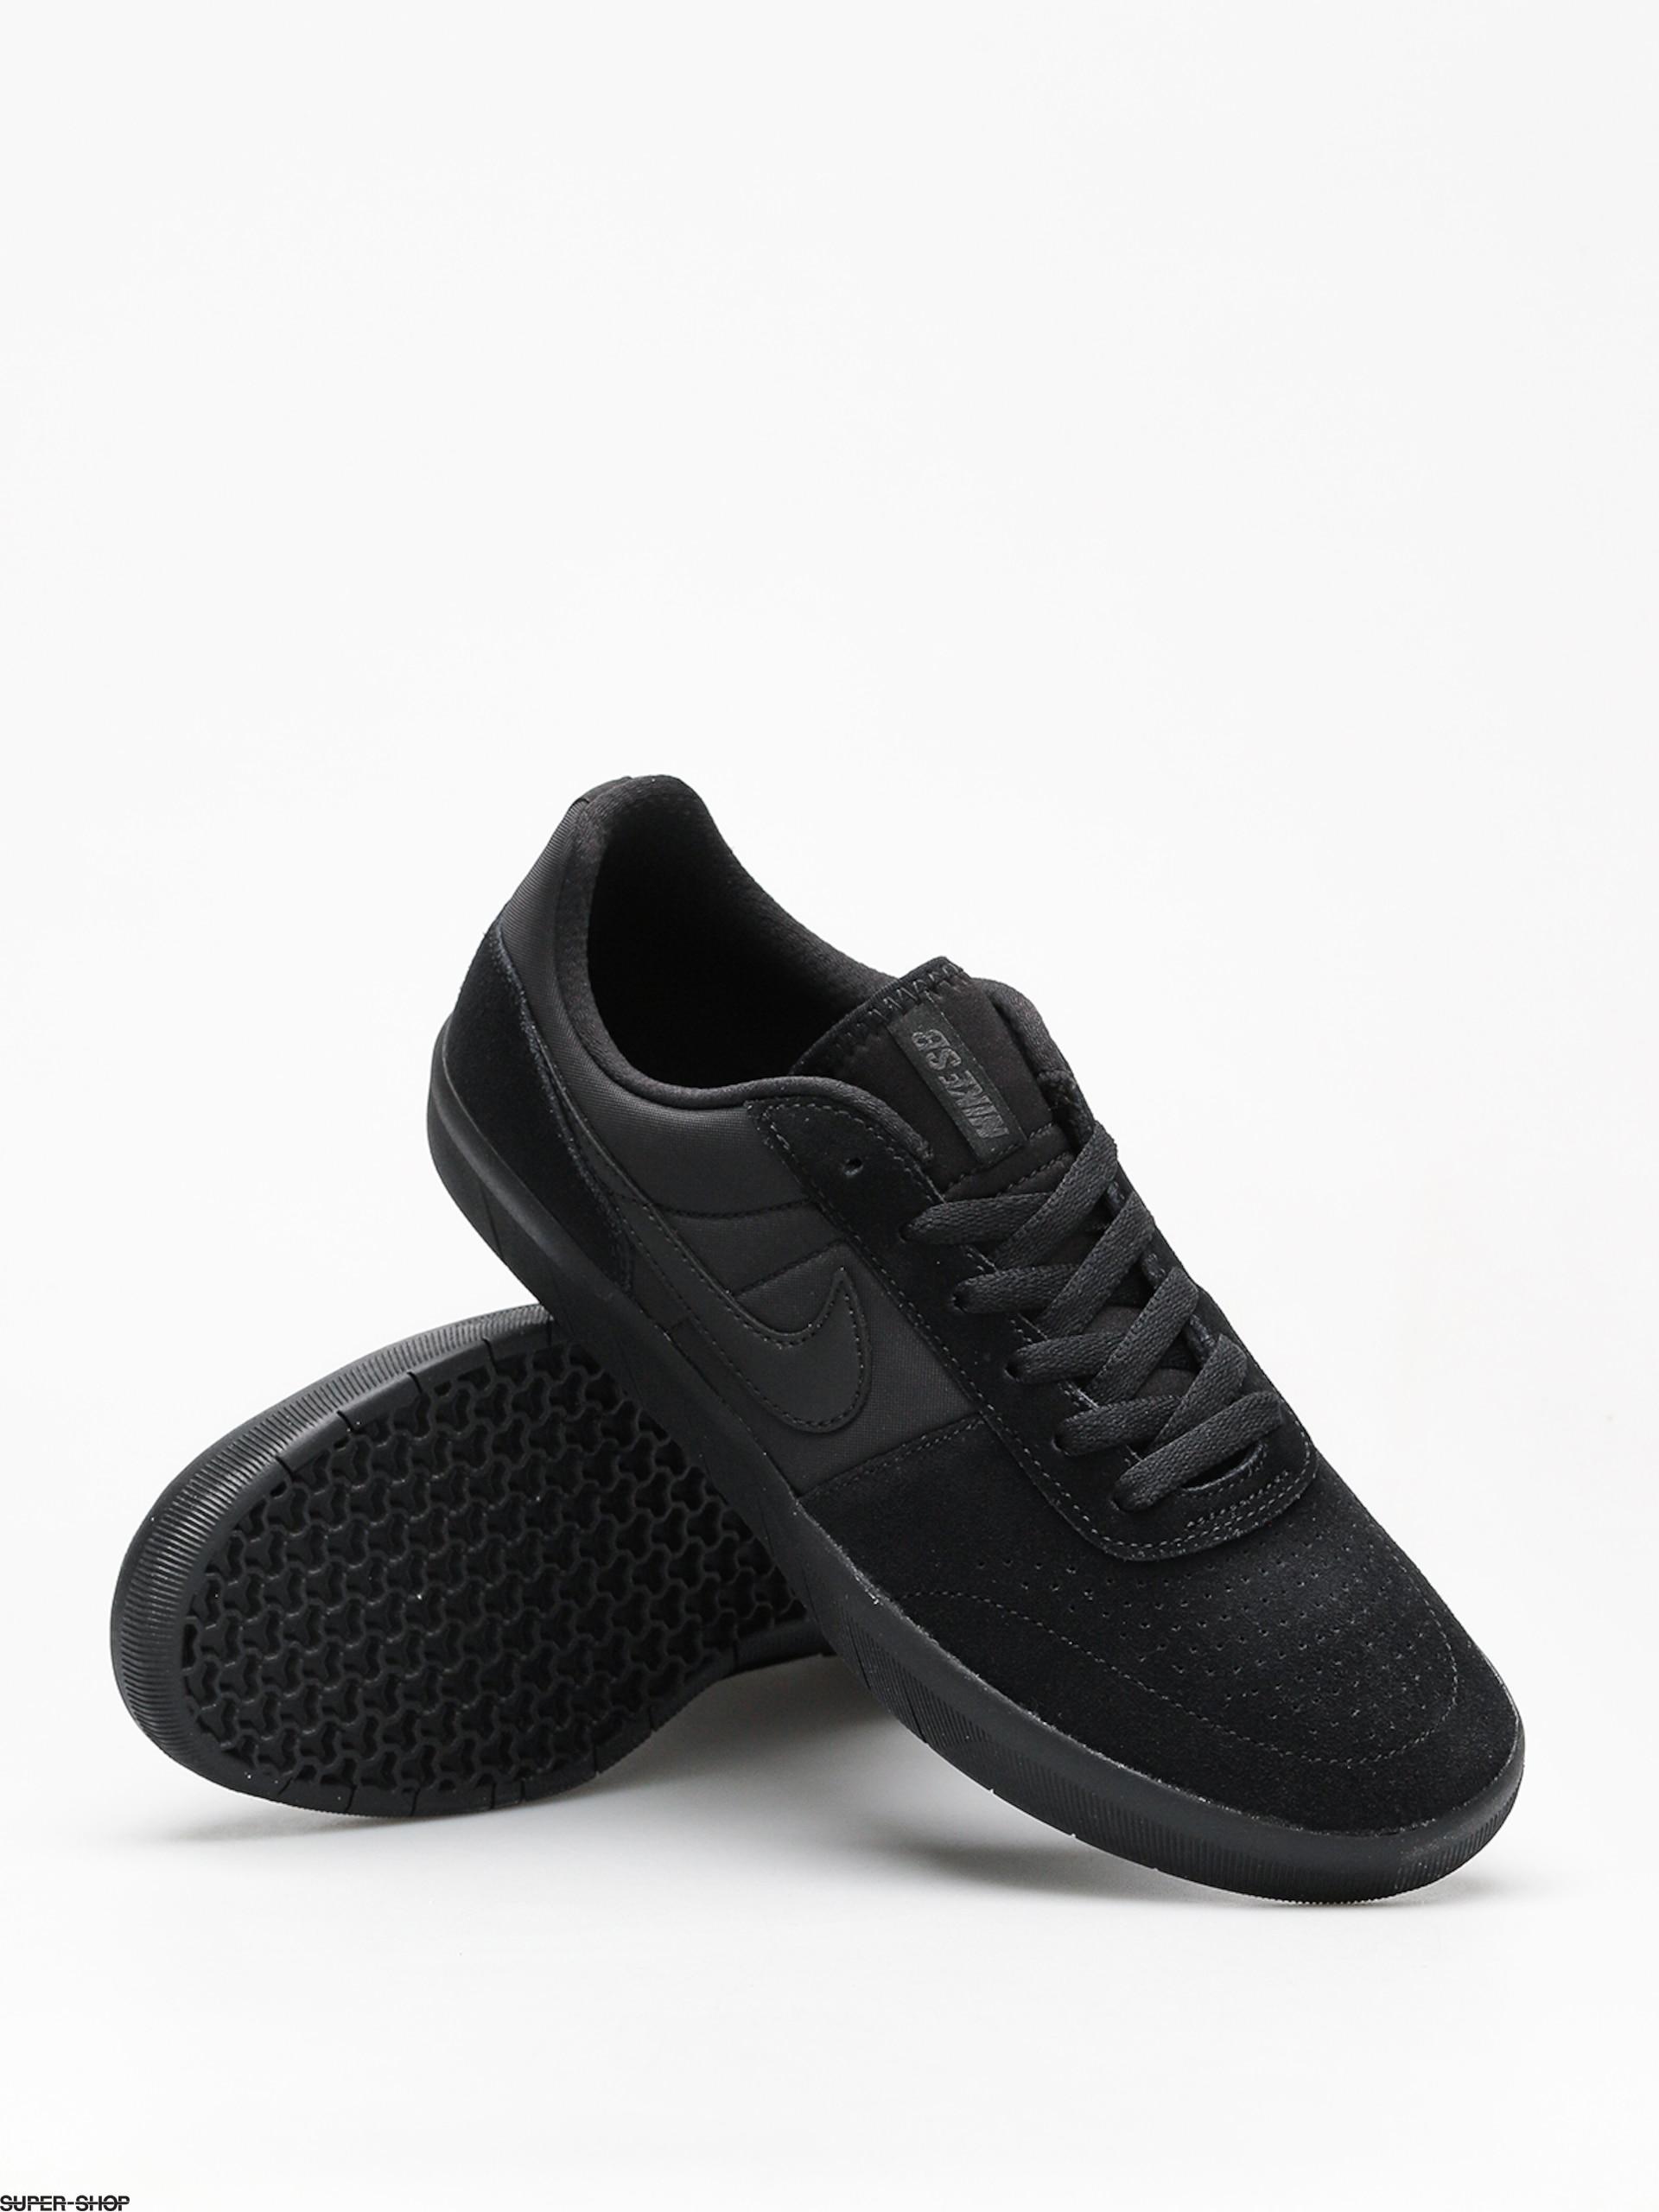 buy popular 2af7c 0194b Nike SB Sb Team Classic Shoes (black black anthracite)